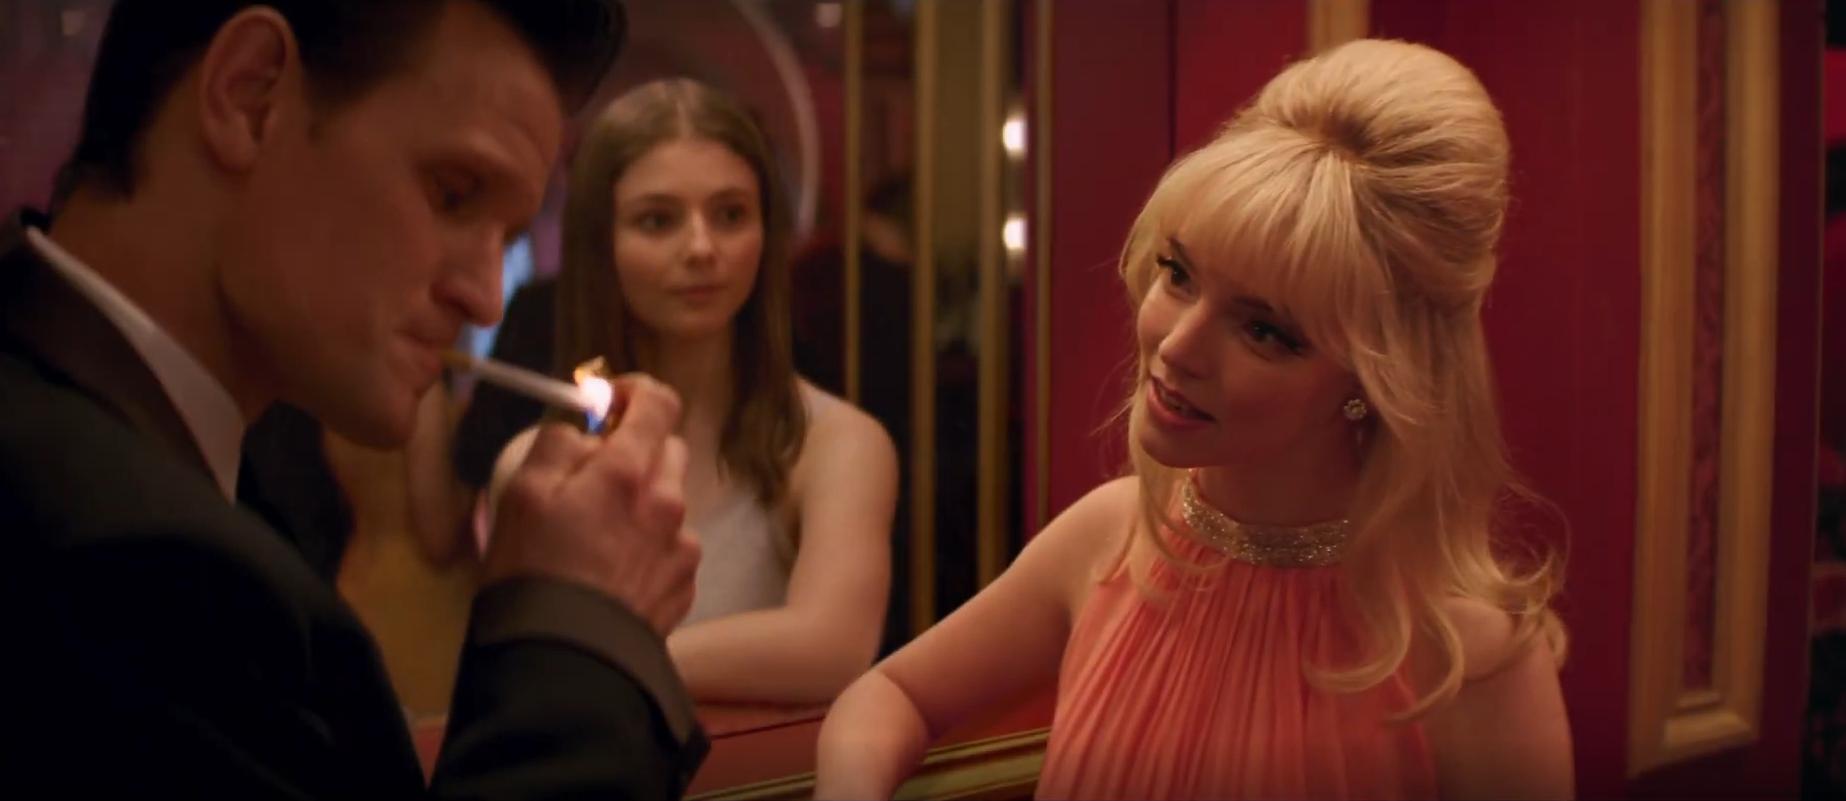 Anya Taylor-Joy, Thomasin McKenzie, and Matt Smith in Last Night in Soho